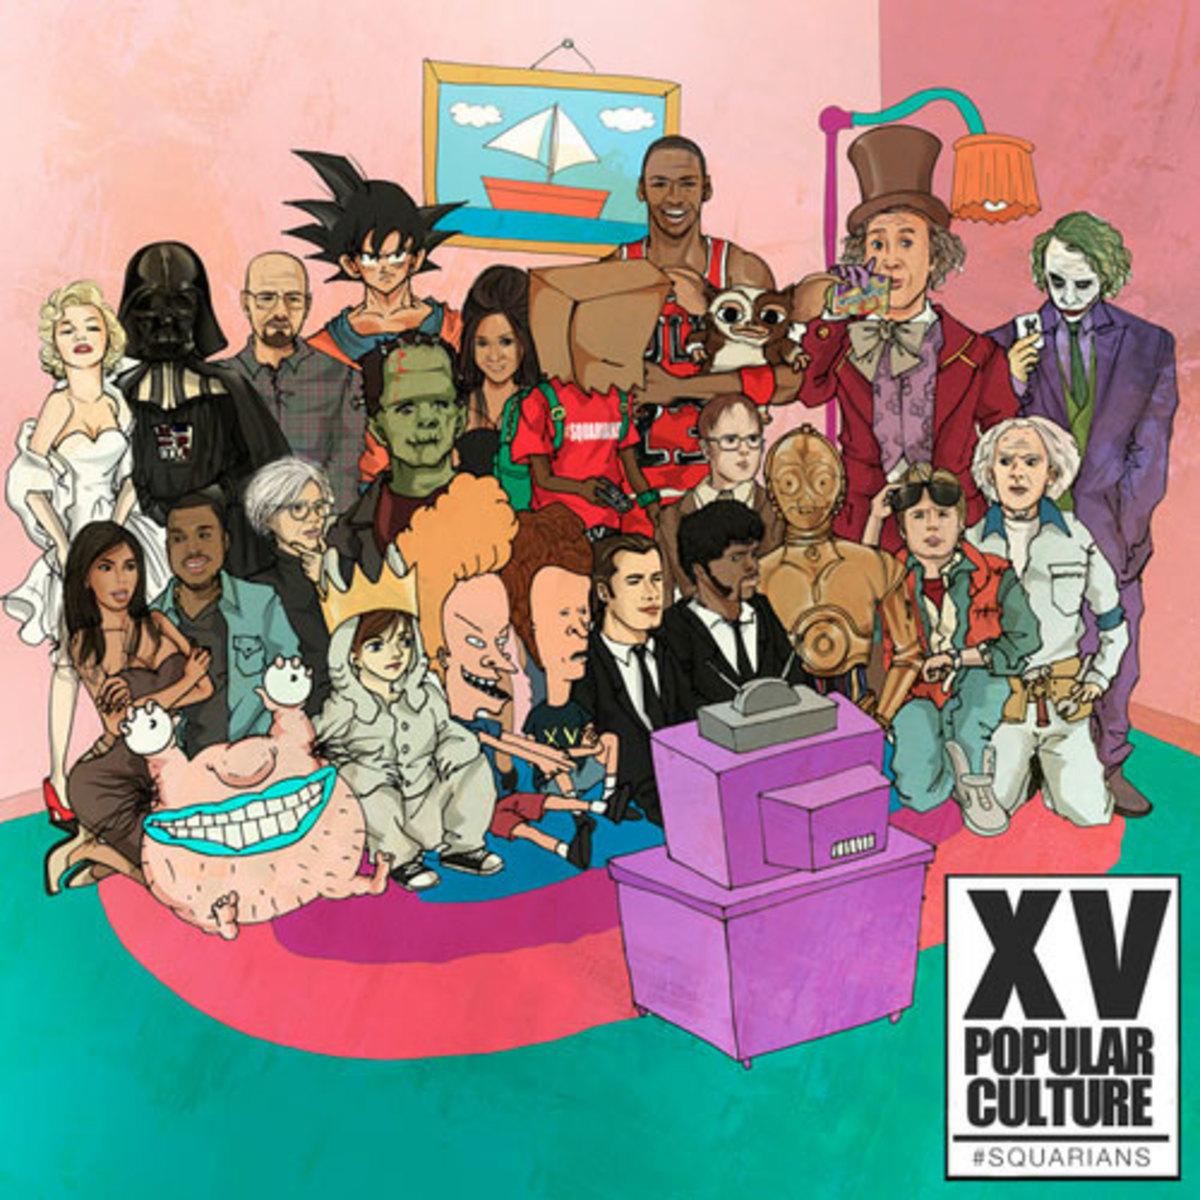 xv-popularculture.jpg